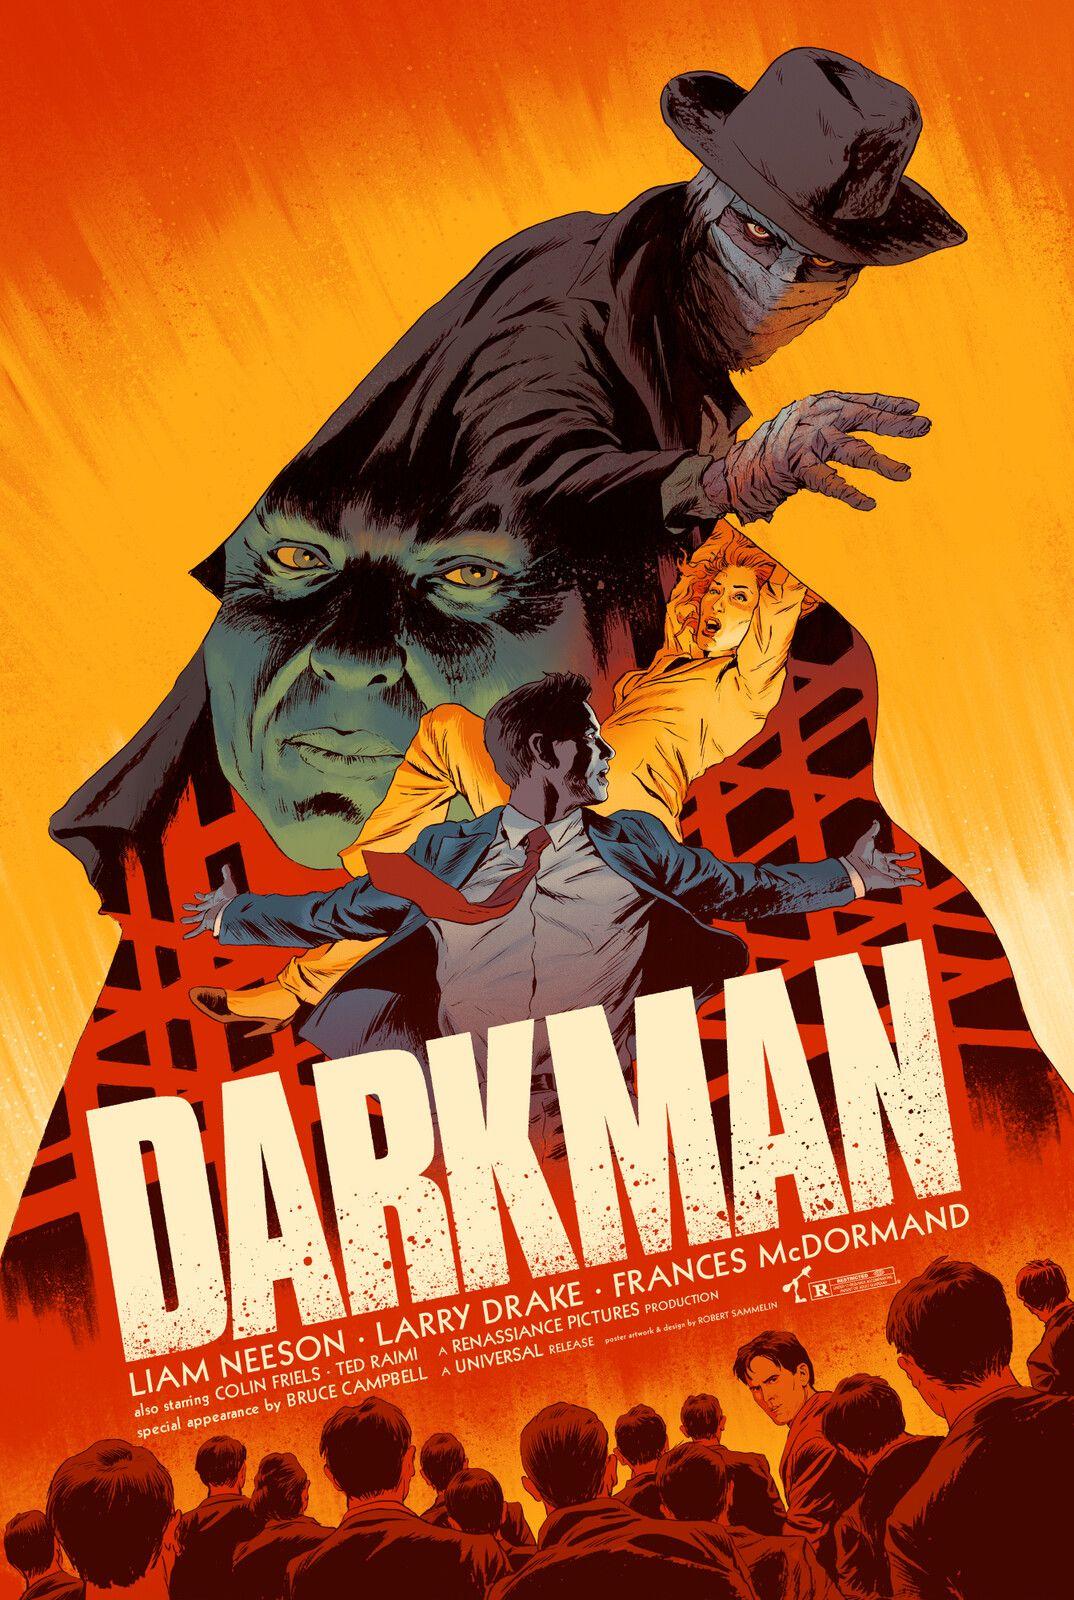 Darkman Screen Print Poster, Robert Sammelin on